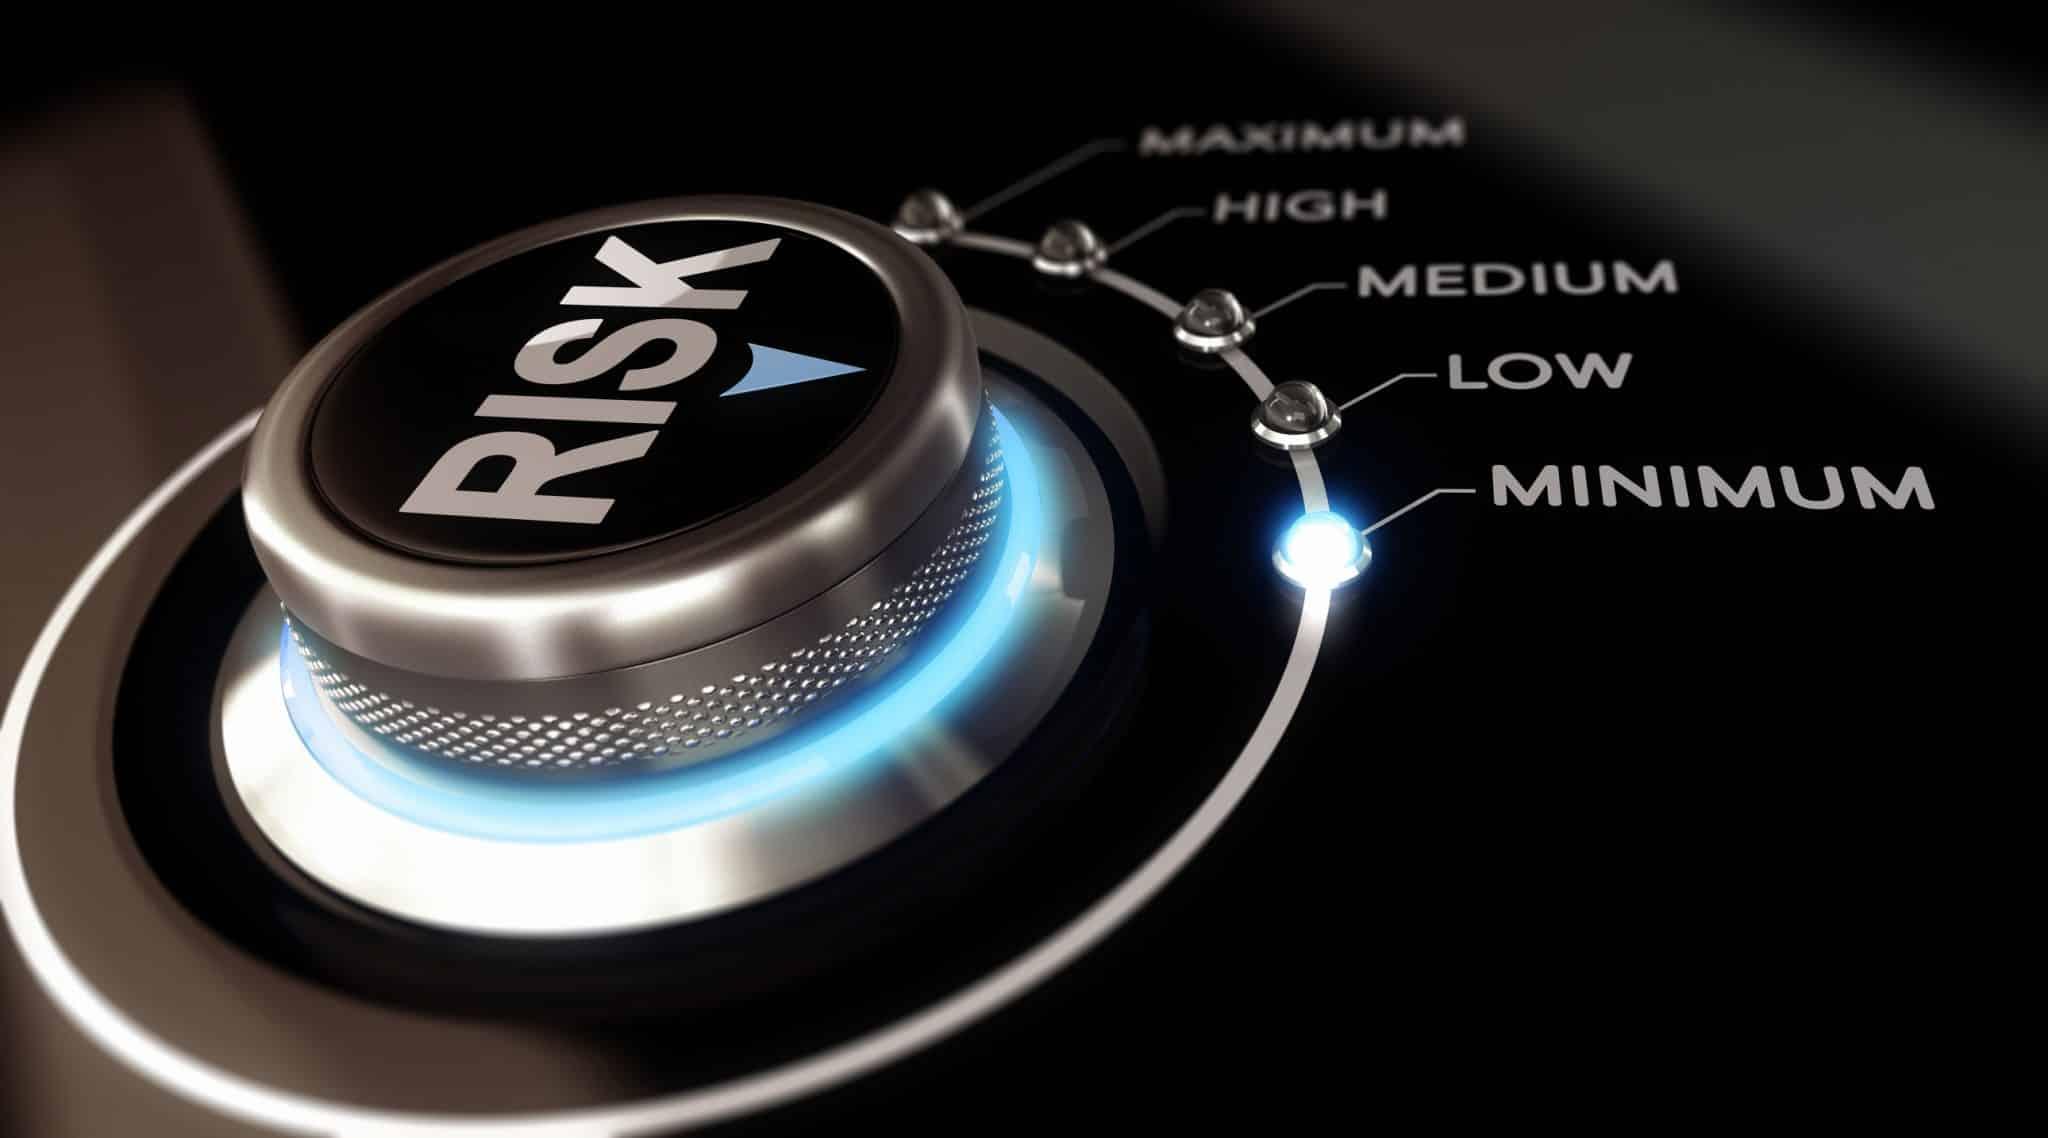 Risikomanagement im Qualitätsmanagement